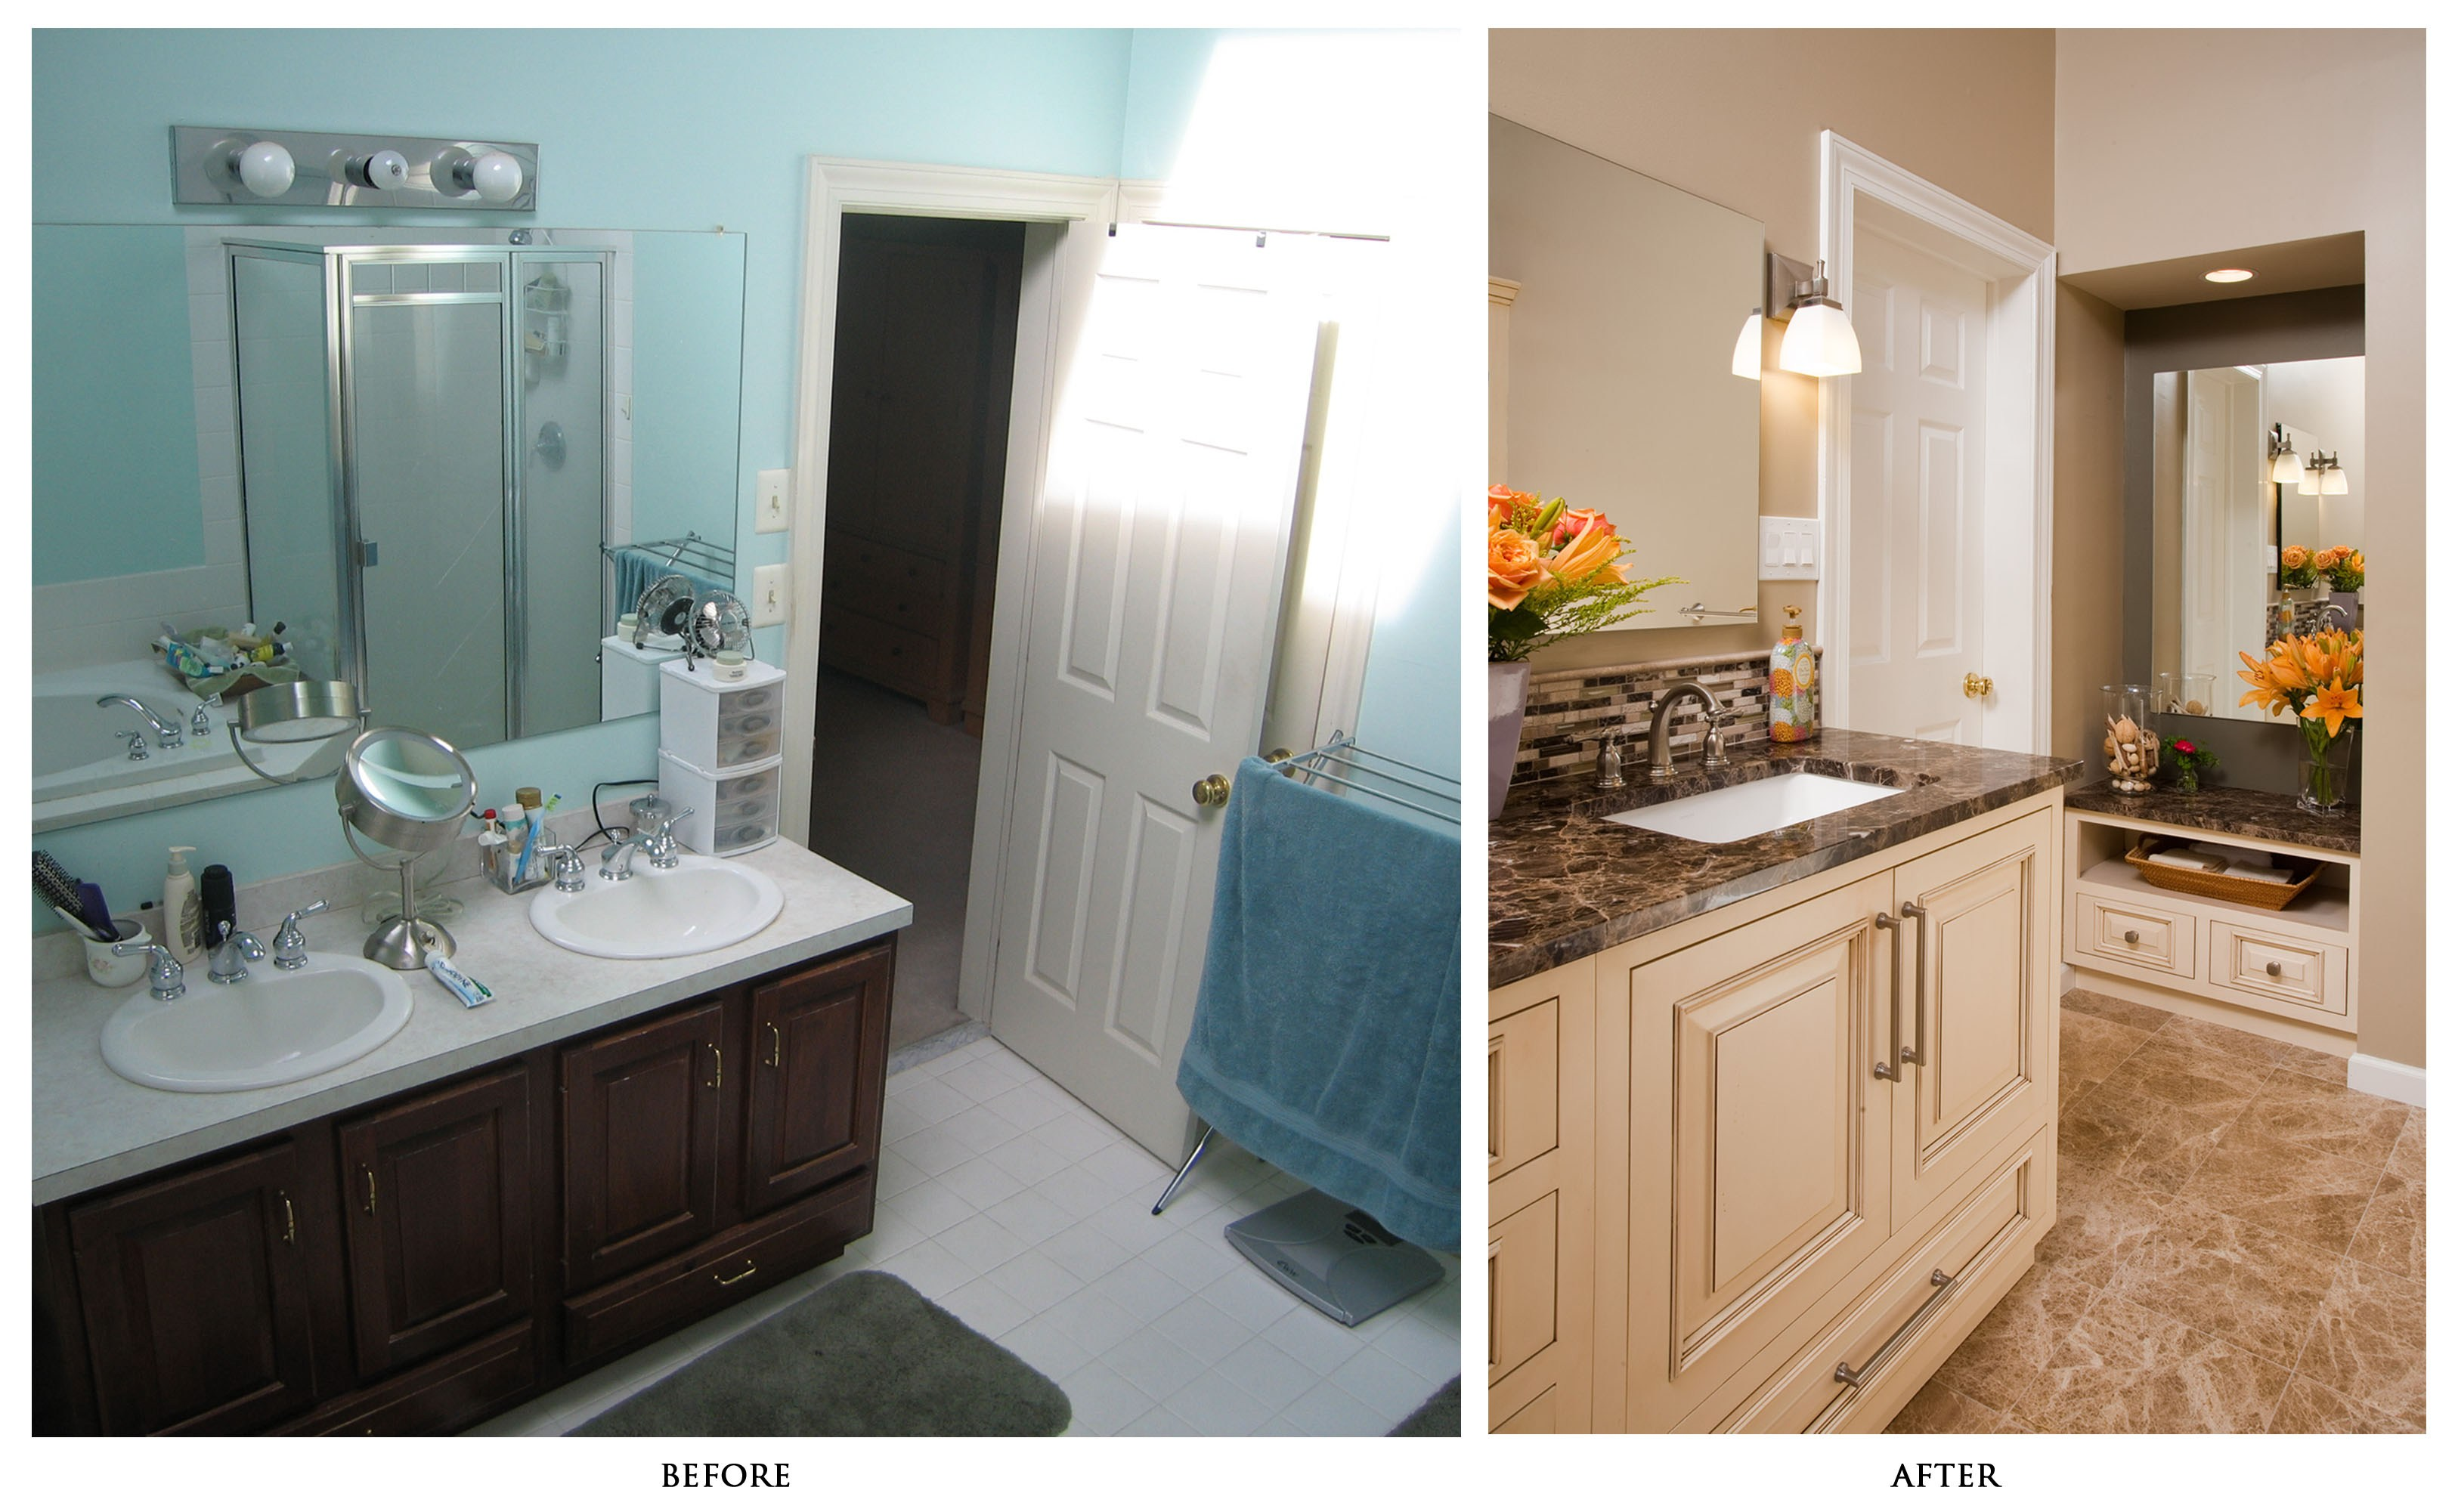 more storage space bathroom remodeling ideas | lovelyspaces.com